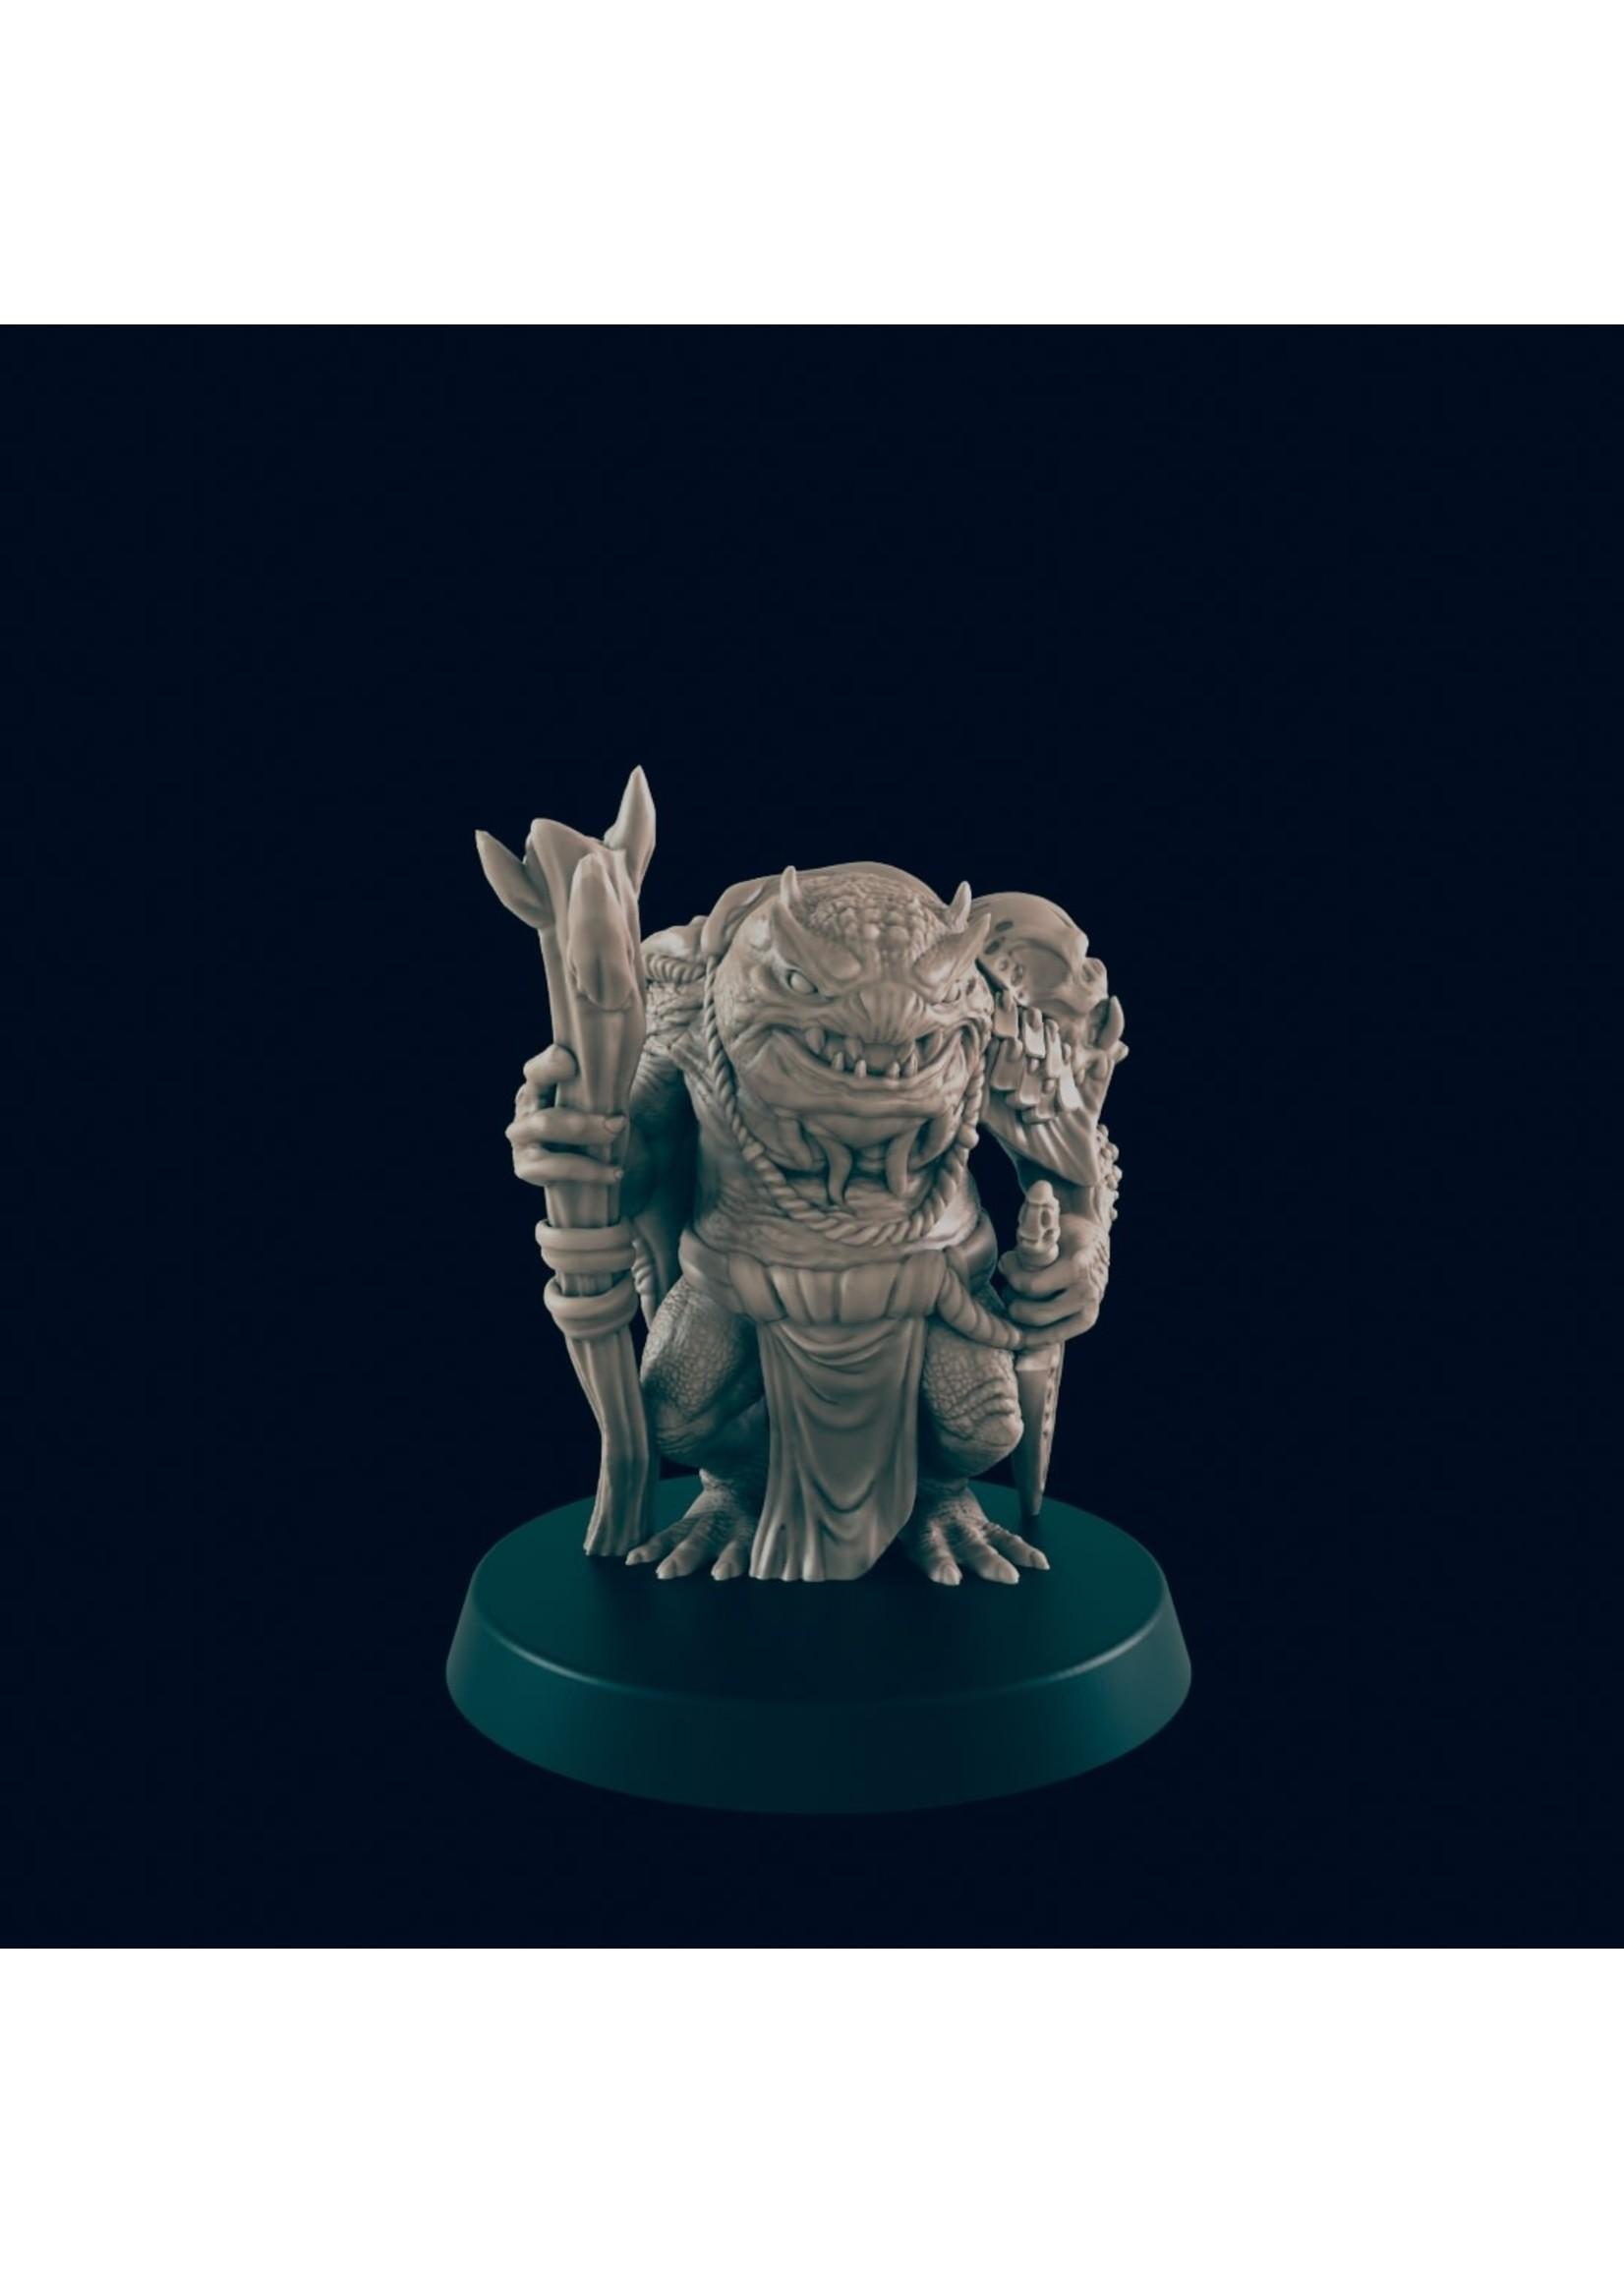 3D Printed Miniature - Green Slaad - Dungeons & Dragons - Beasts and Baddies KS